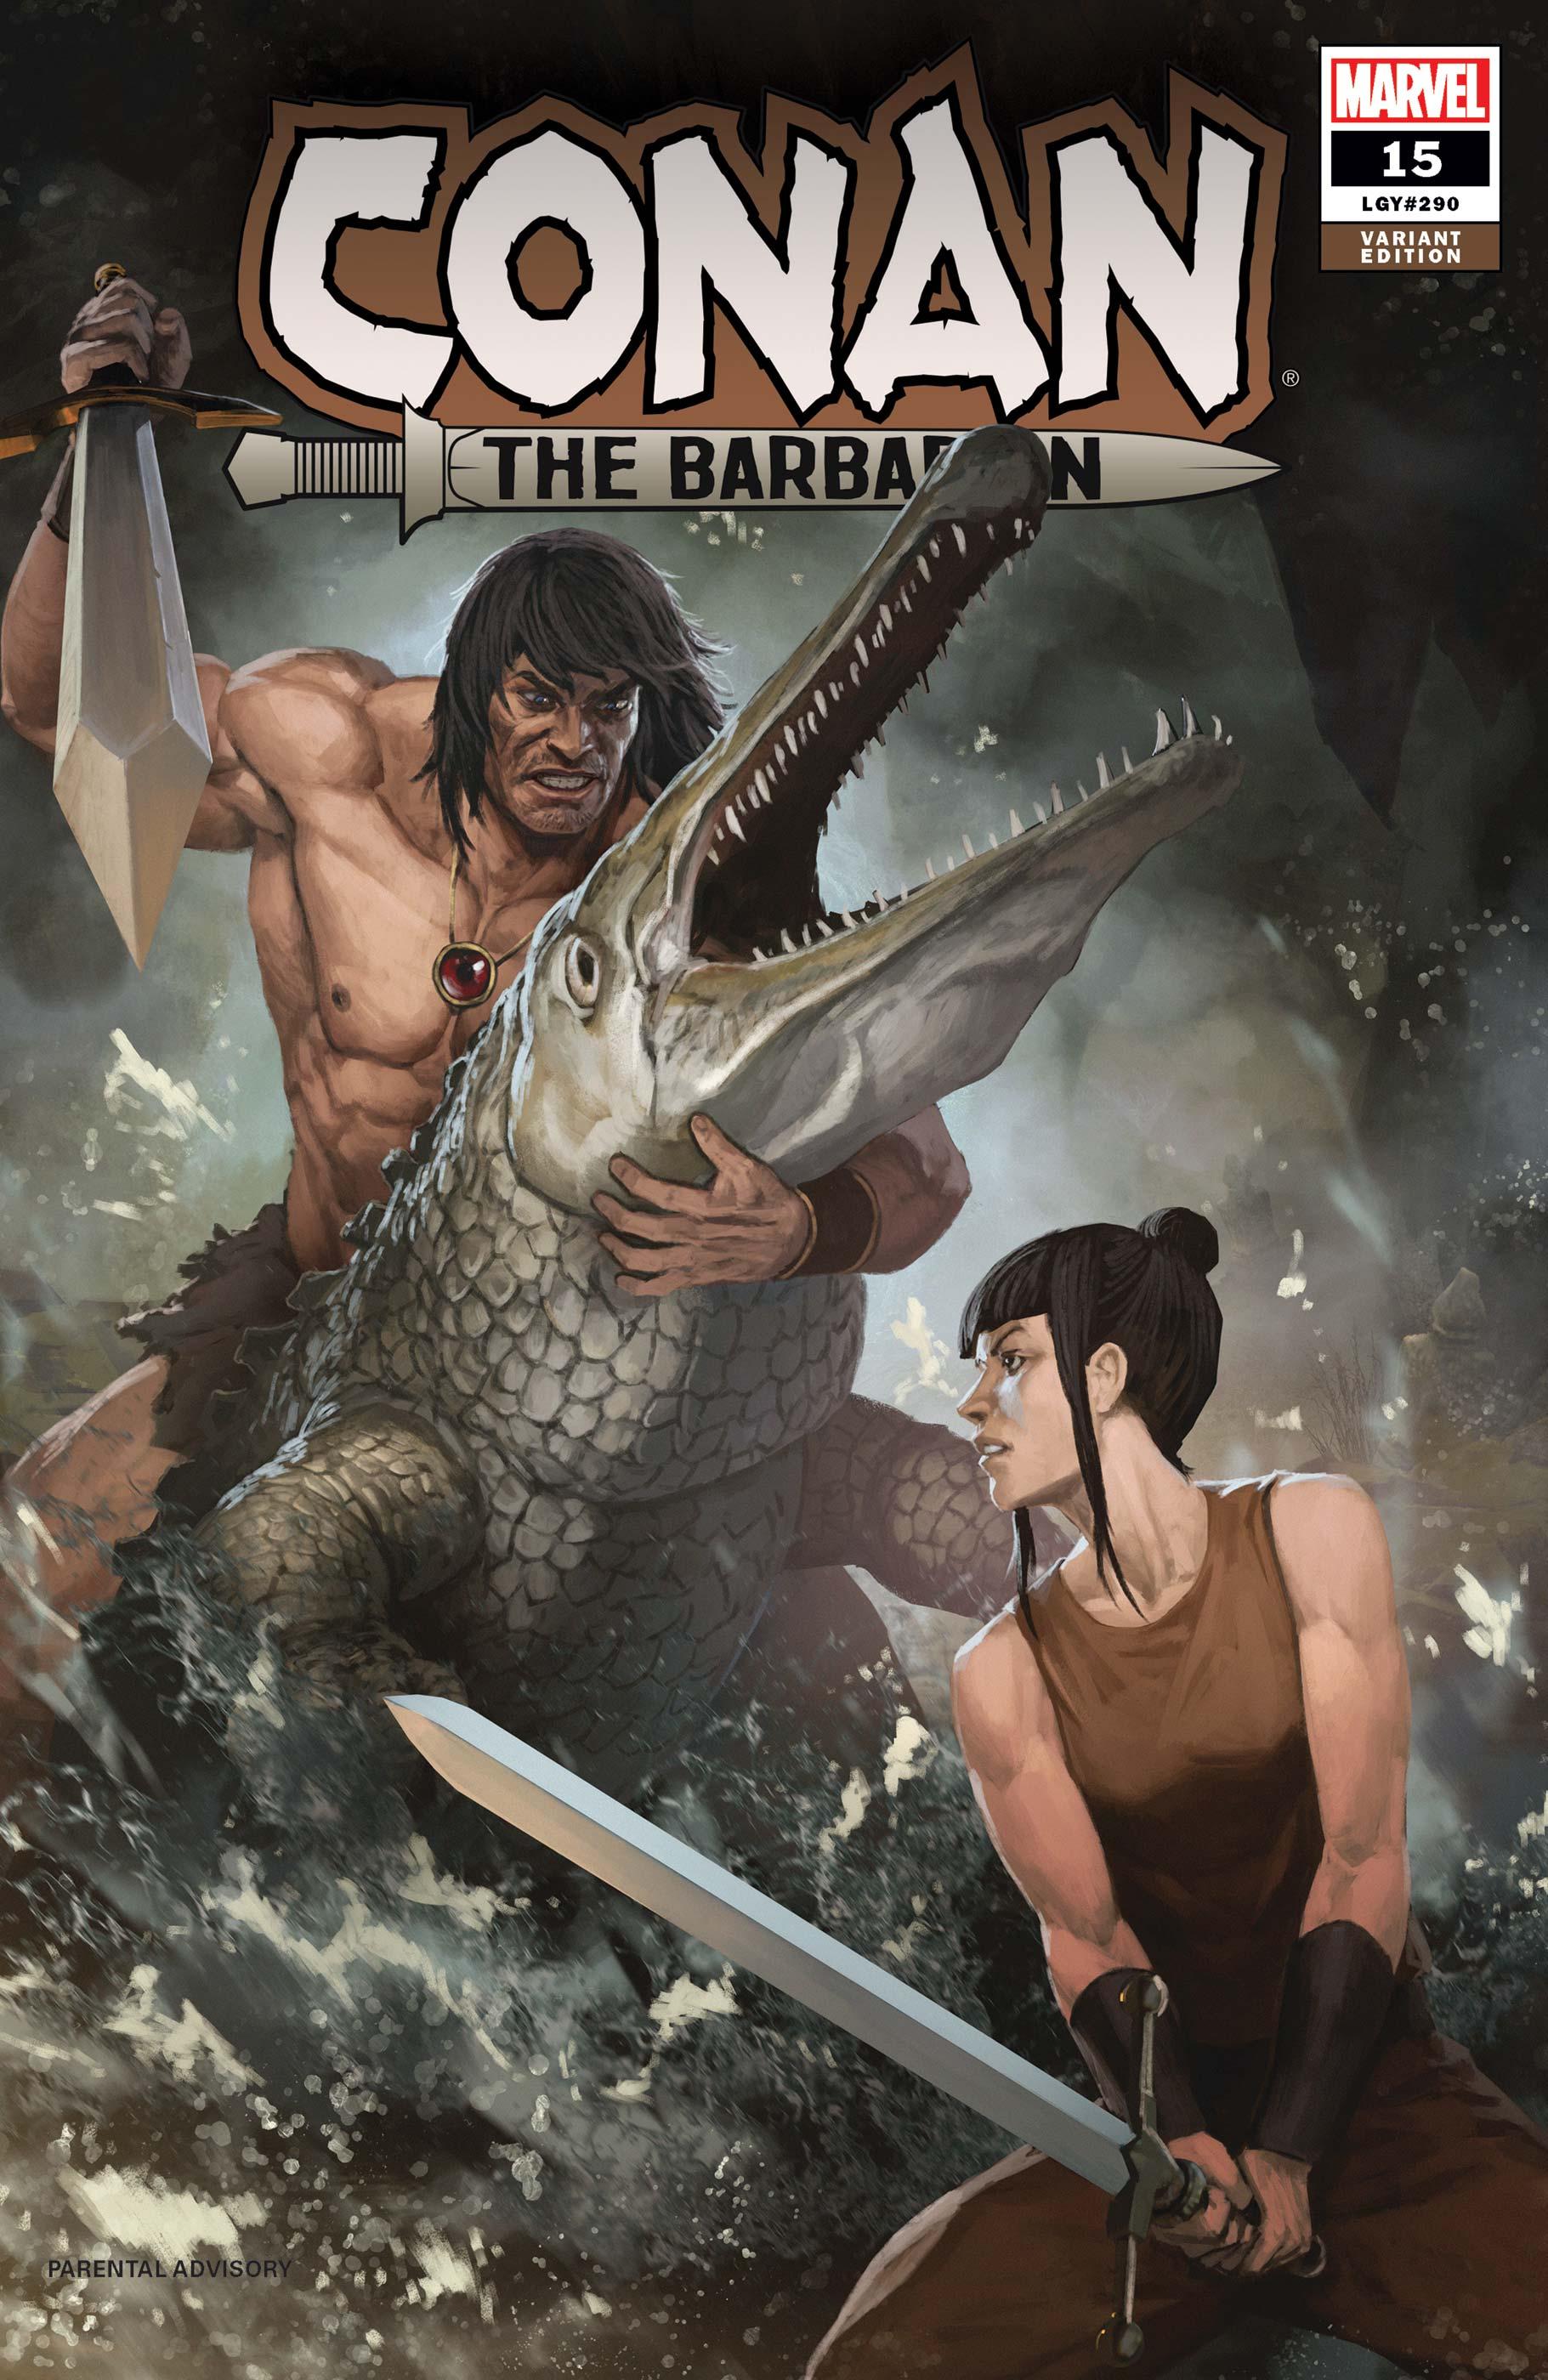 Conan the Barbarian (2019) #15 (Variant)